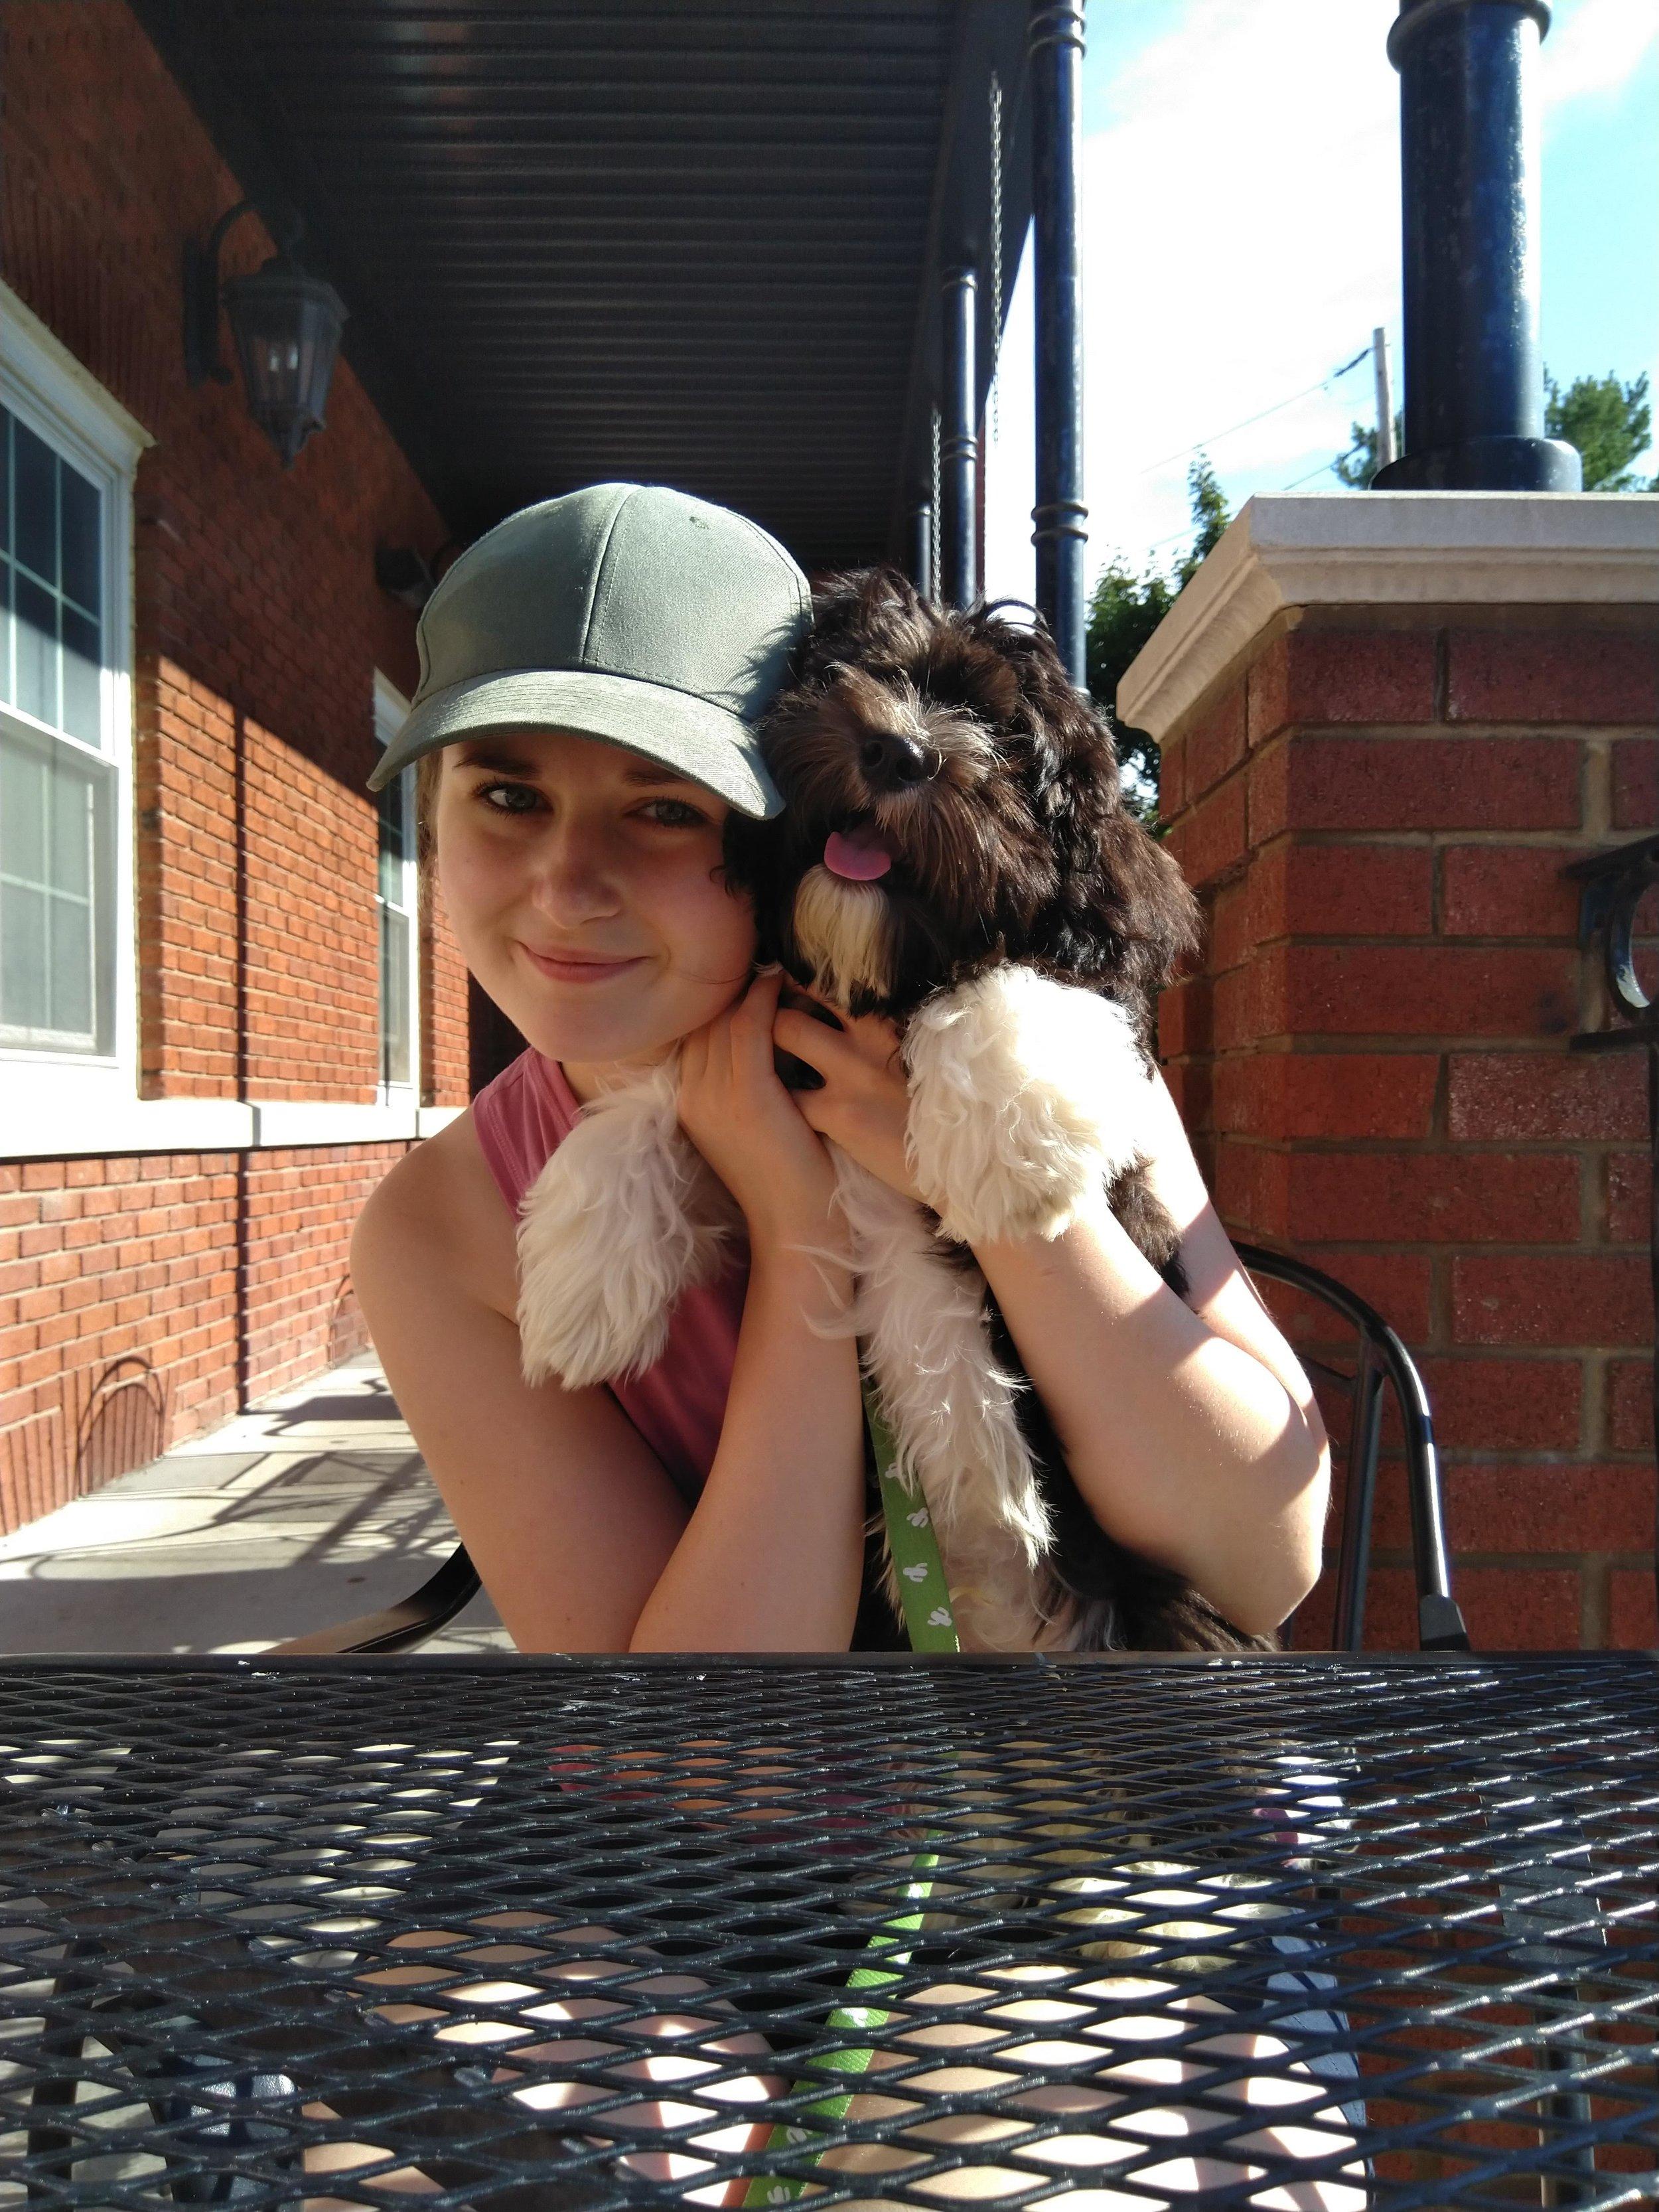 Me (Tara) and my adorable pupper-nephew.